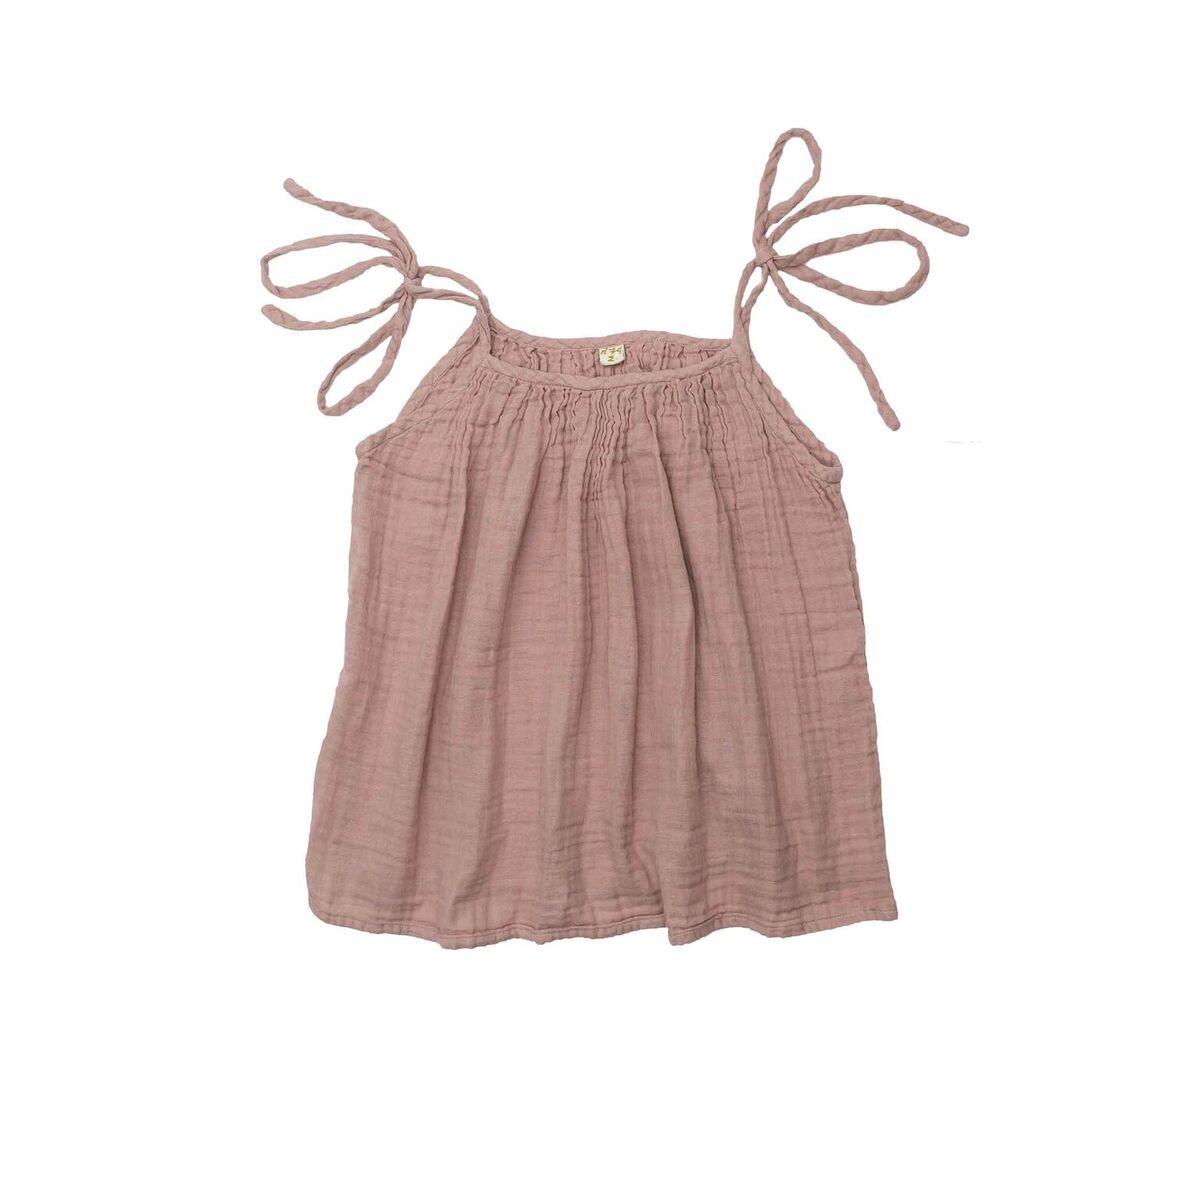 Numero 74 Mia Mum Top Dusty Pink